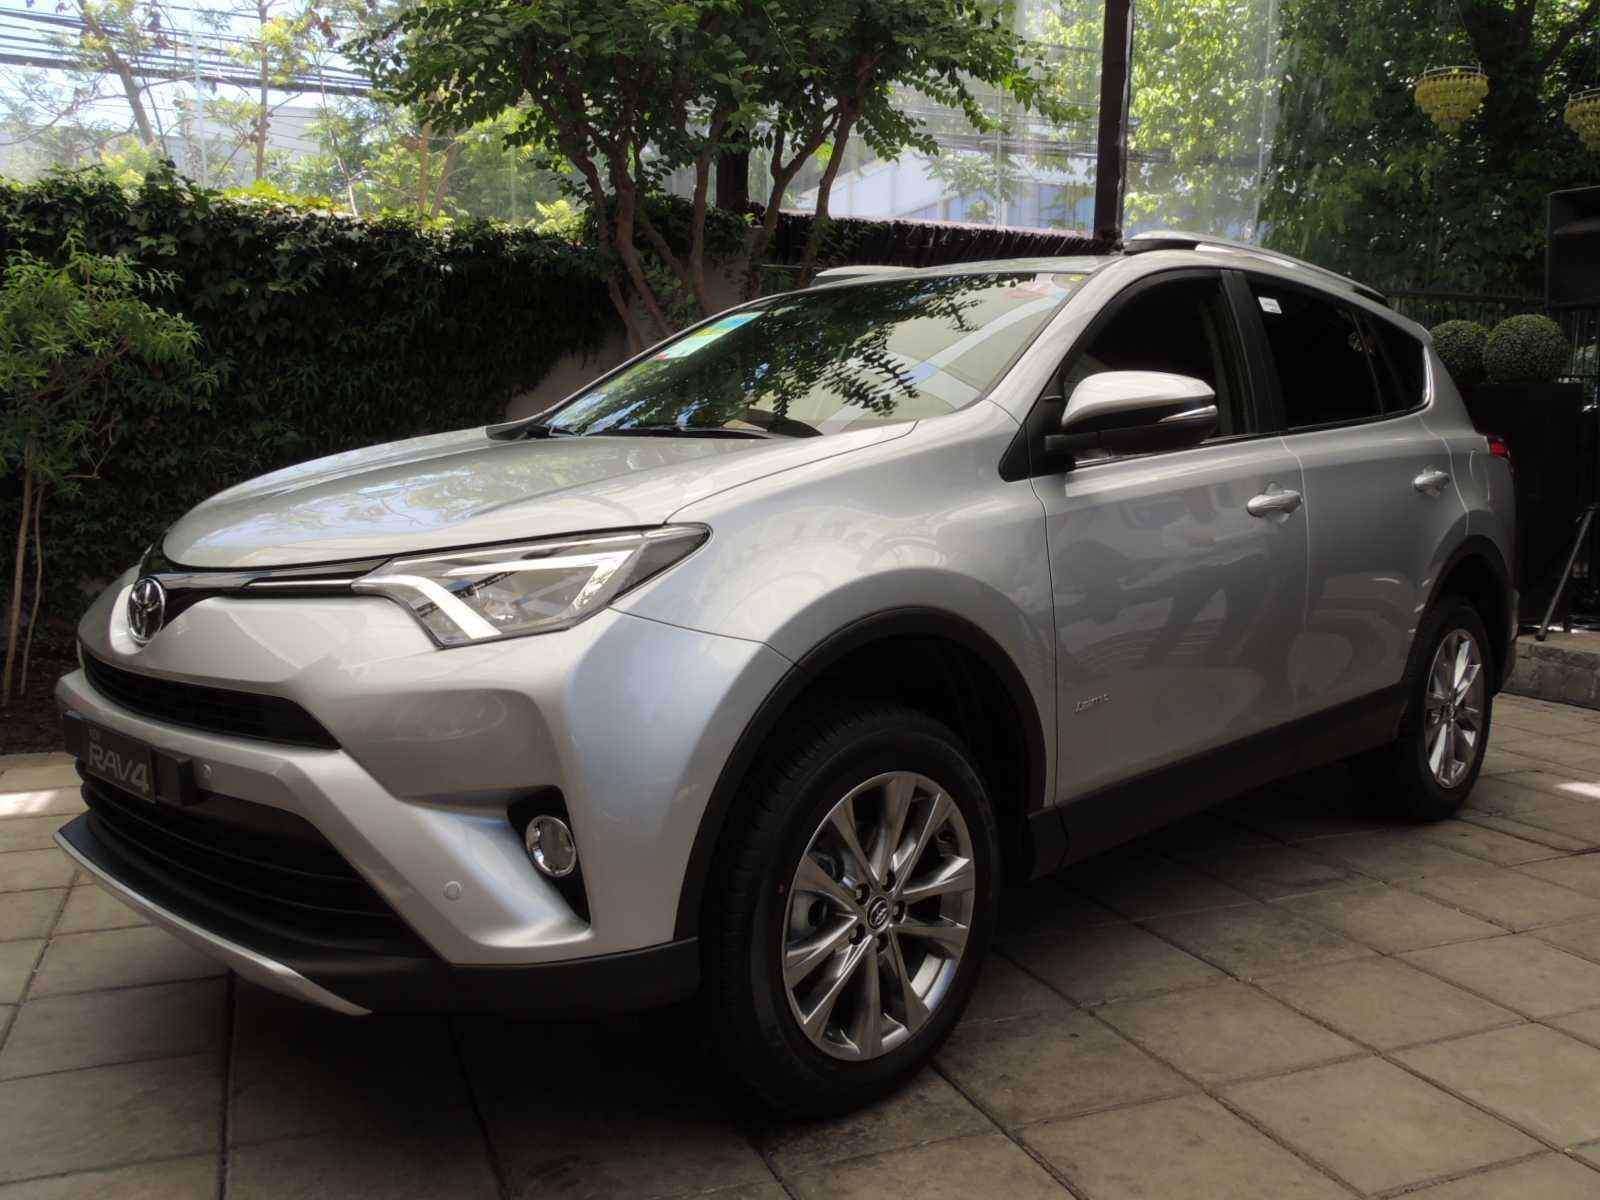 191 Qu 233 De Nuevo Debemos Esperar De La Toyota Rav4 2019